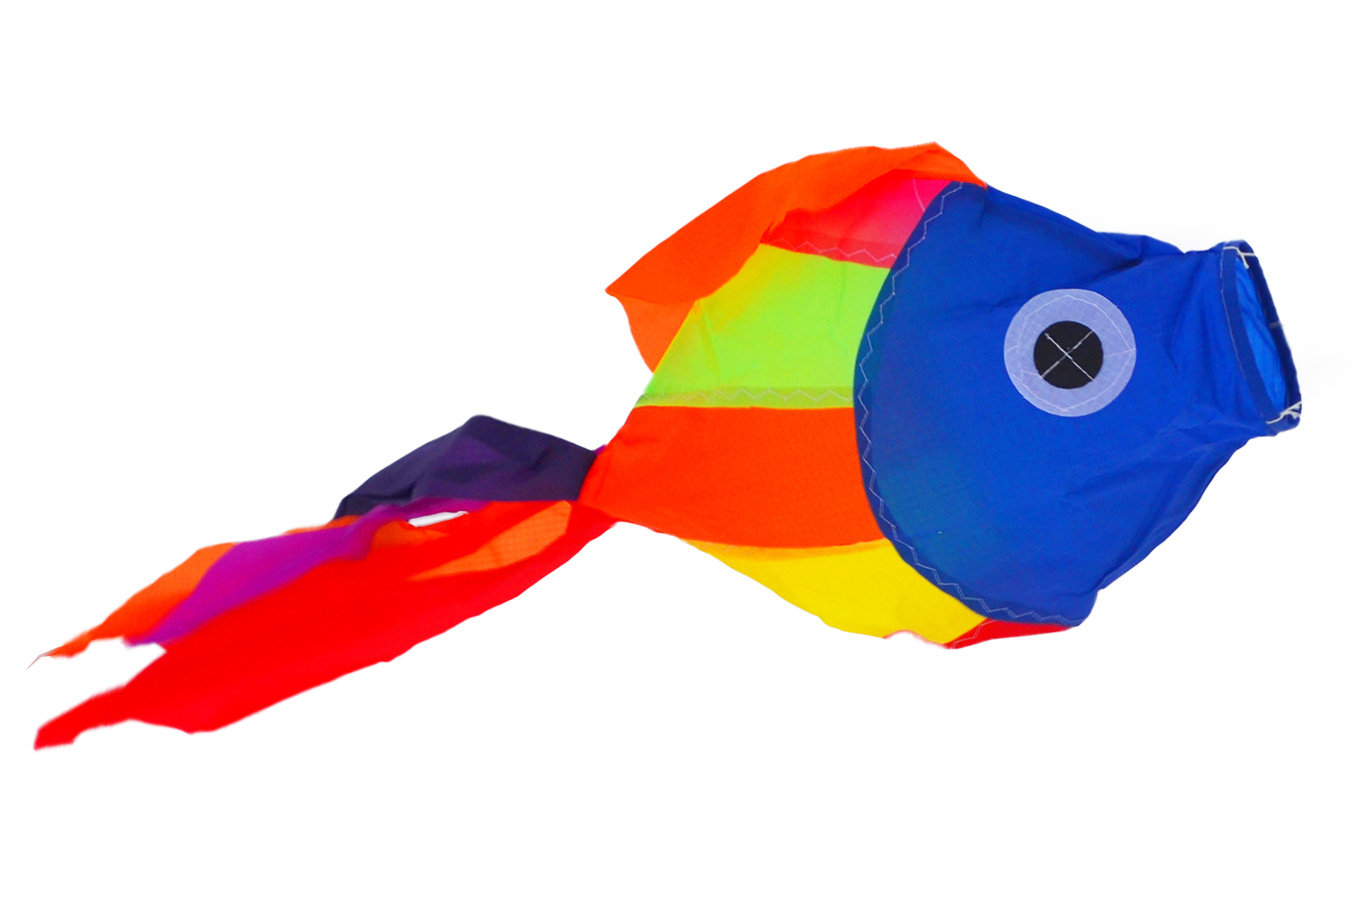 Надуваемая конструкция Рыбка [FLFF]